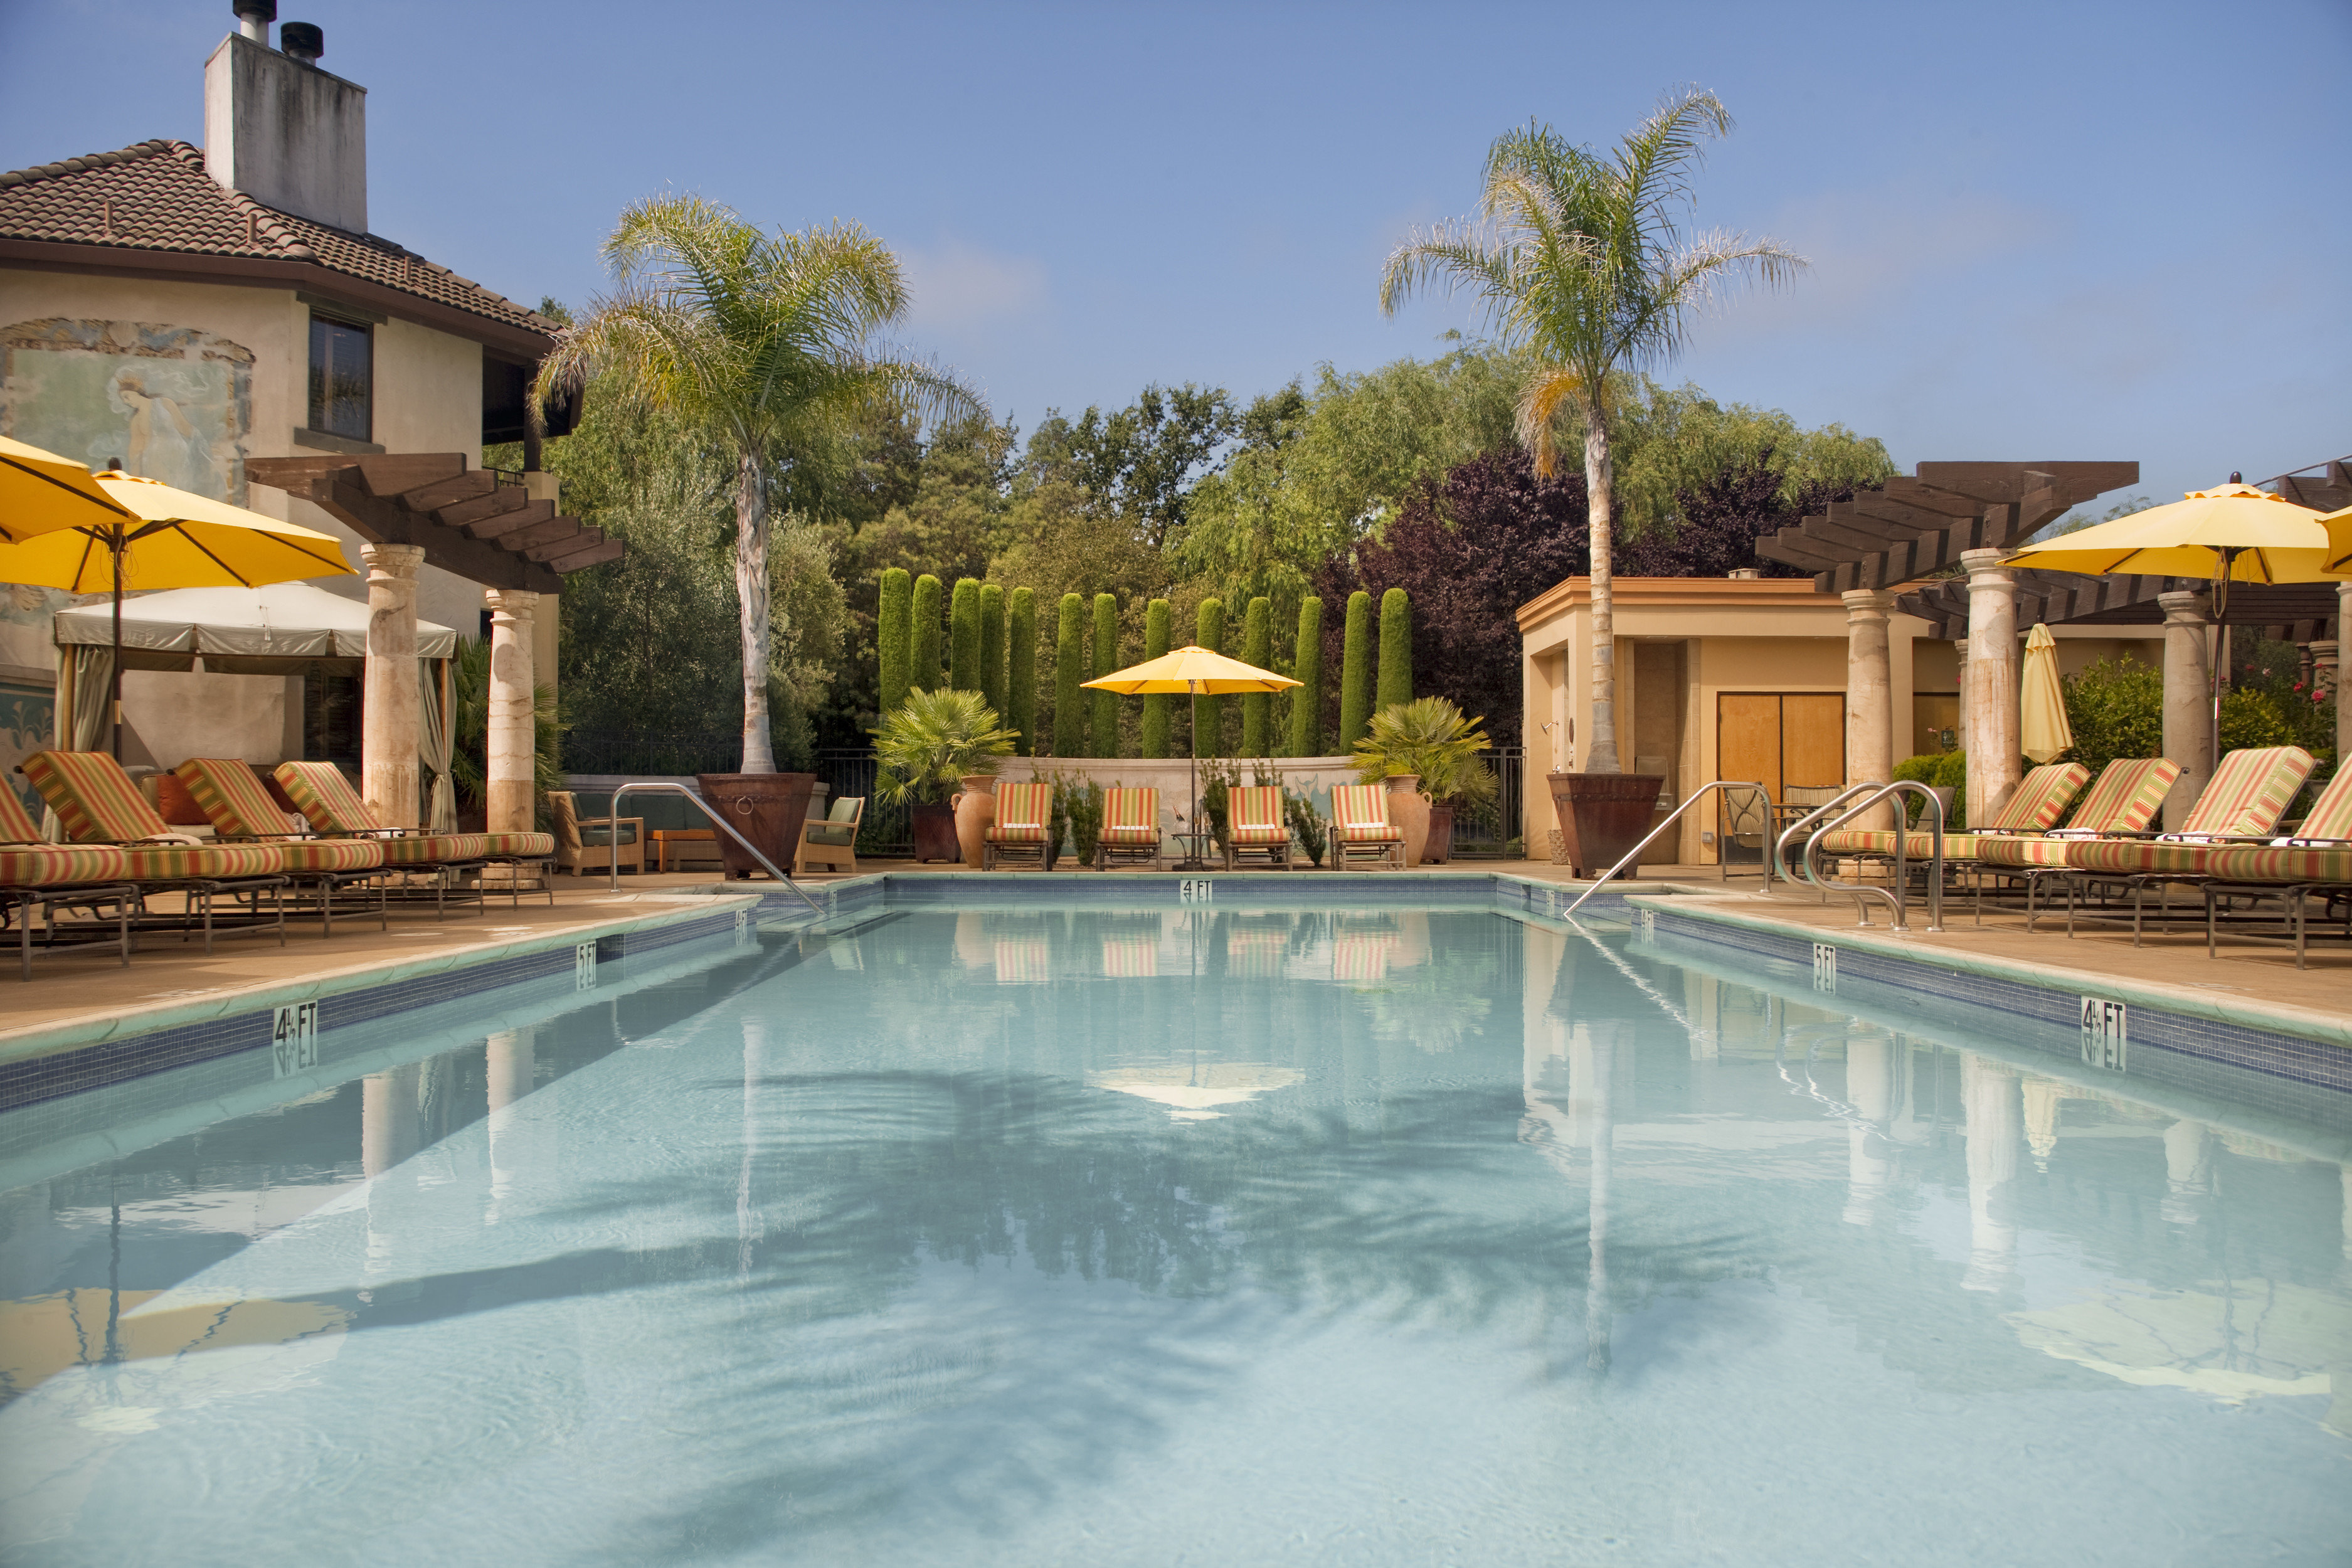 Hotels Lounge Modern Pool Romance Spa Retreats Trip Ideas tree swimming pool property Villa Resort backyard reflecting pool home mansion hacienda house